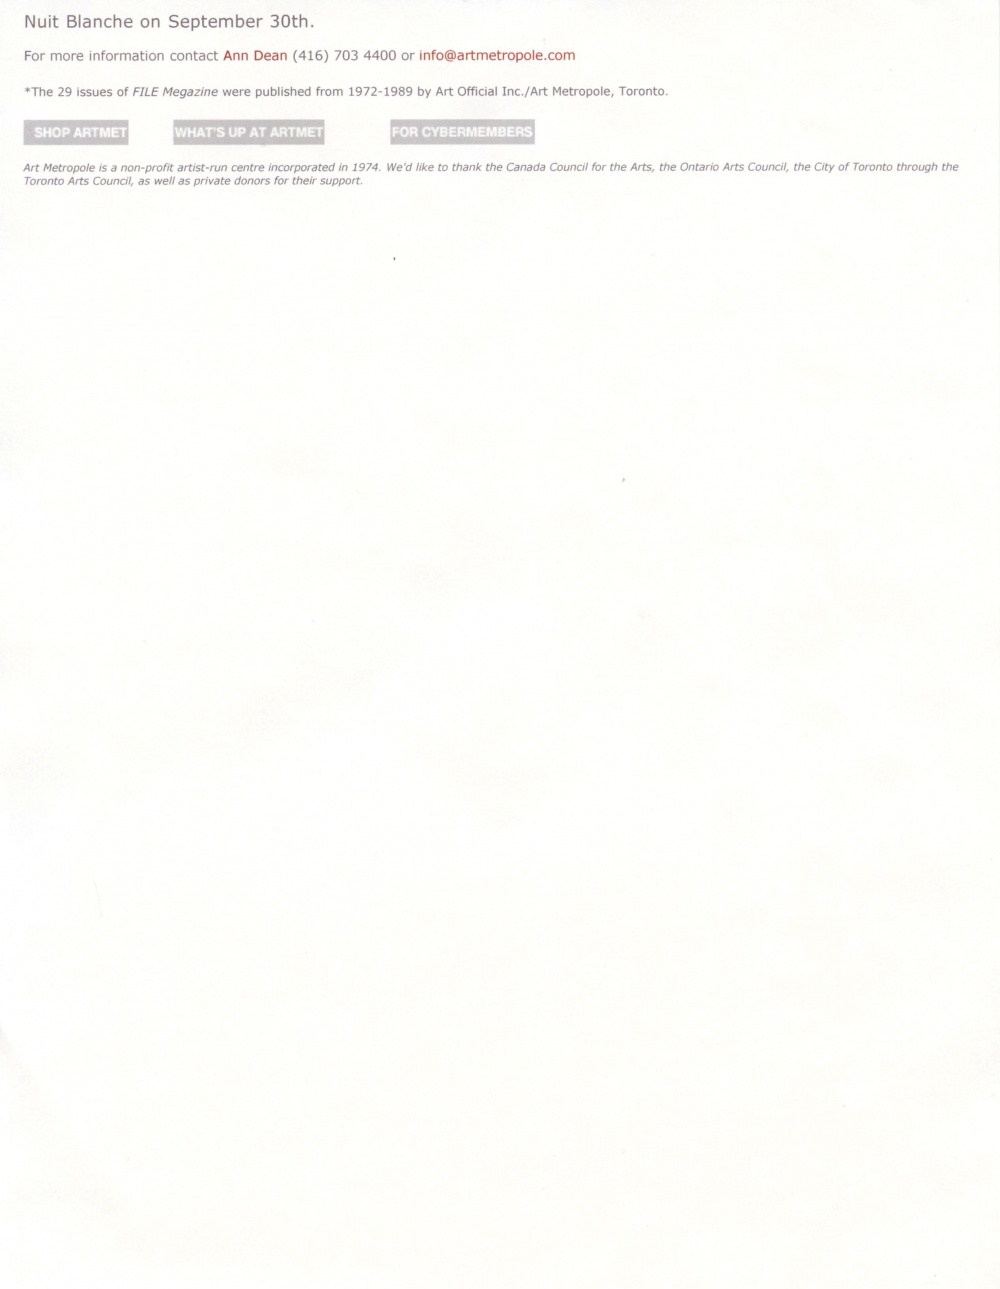 AMA0614.2, page 12